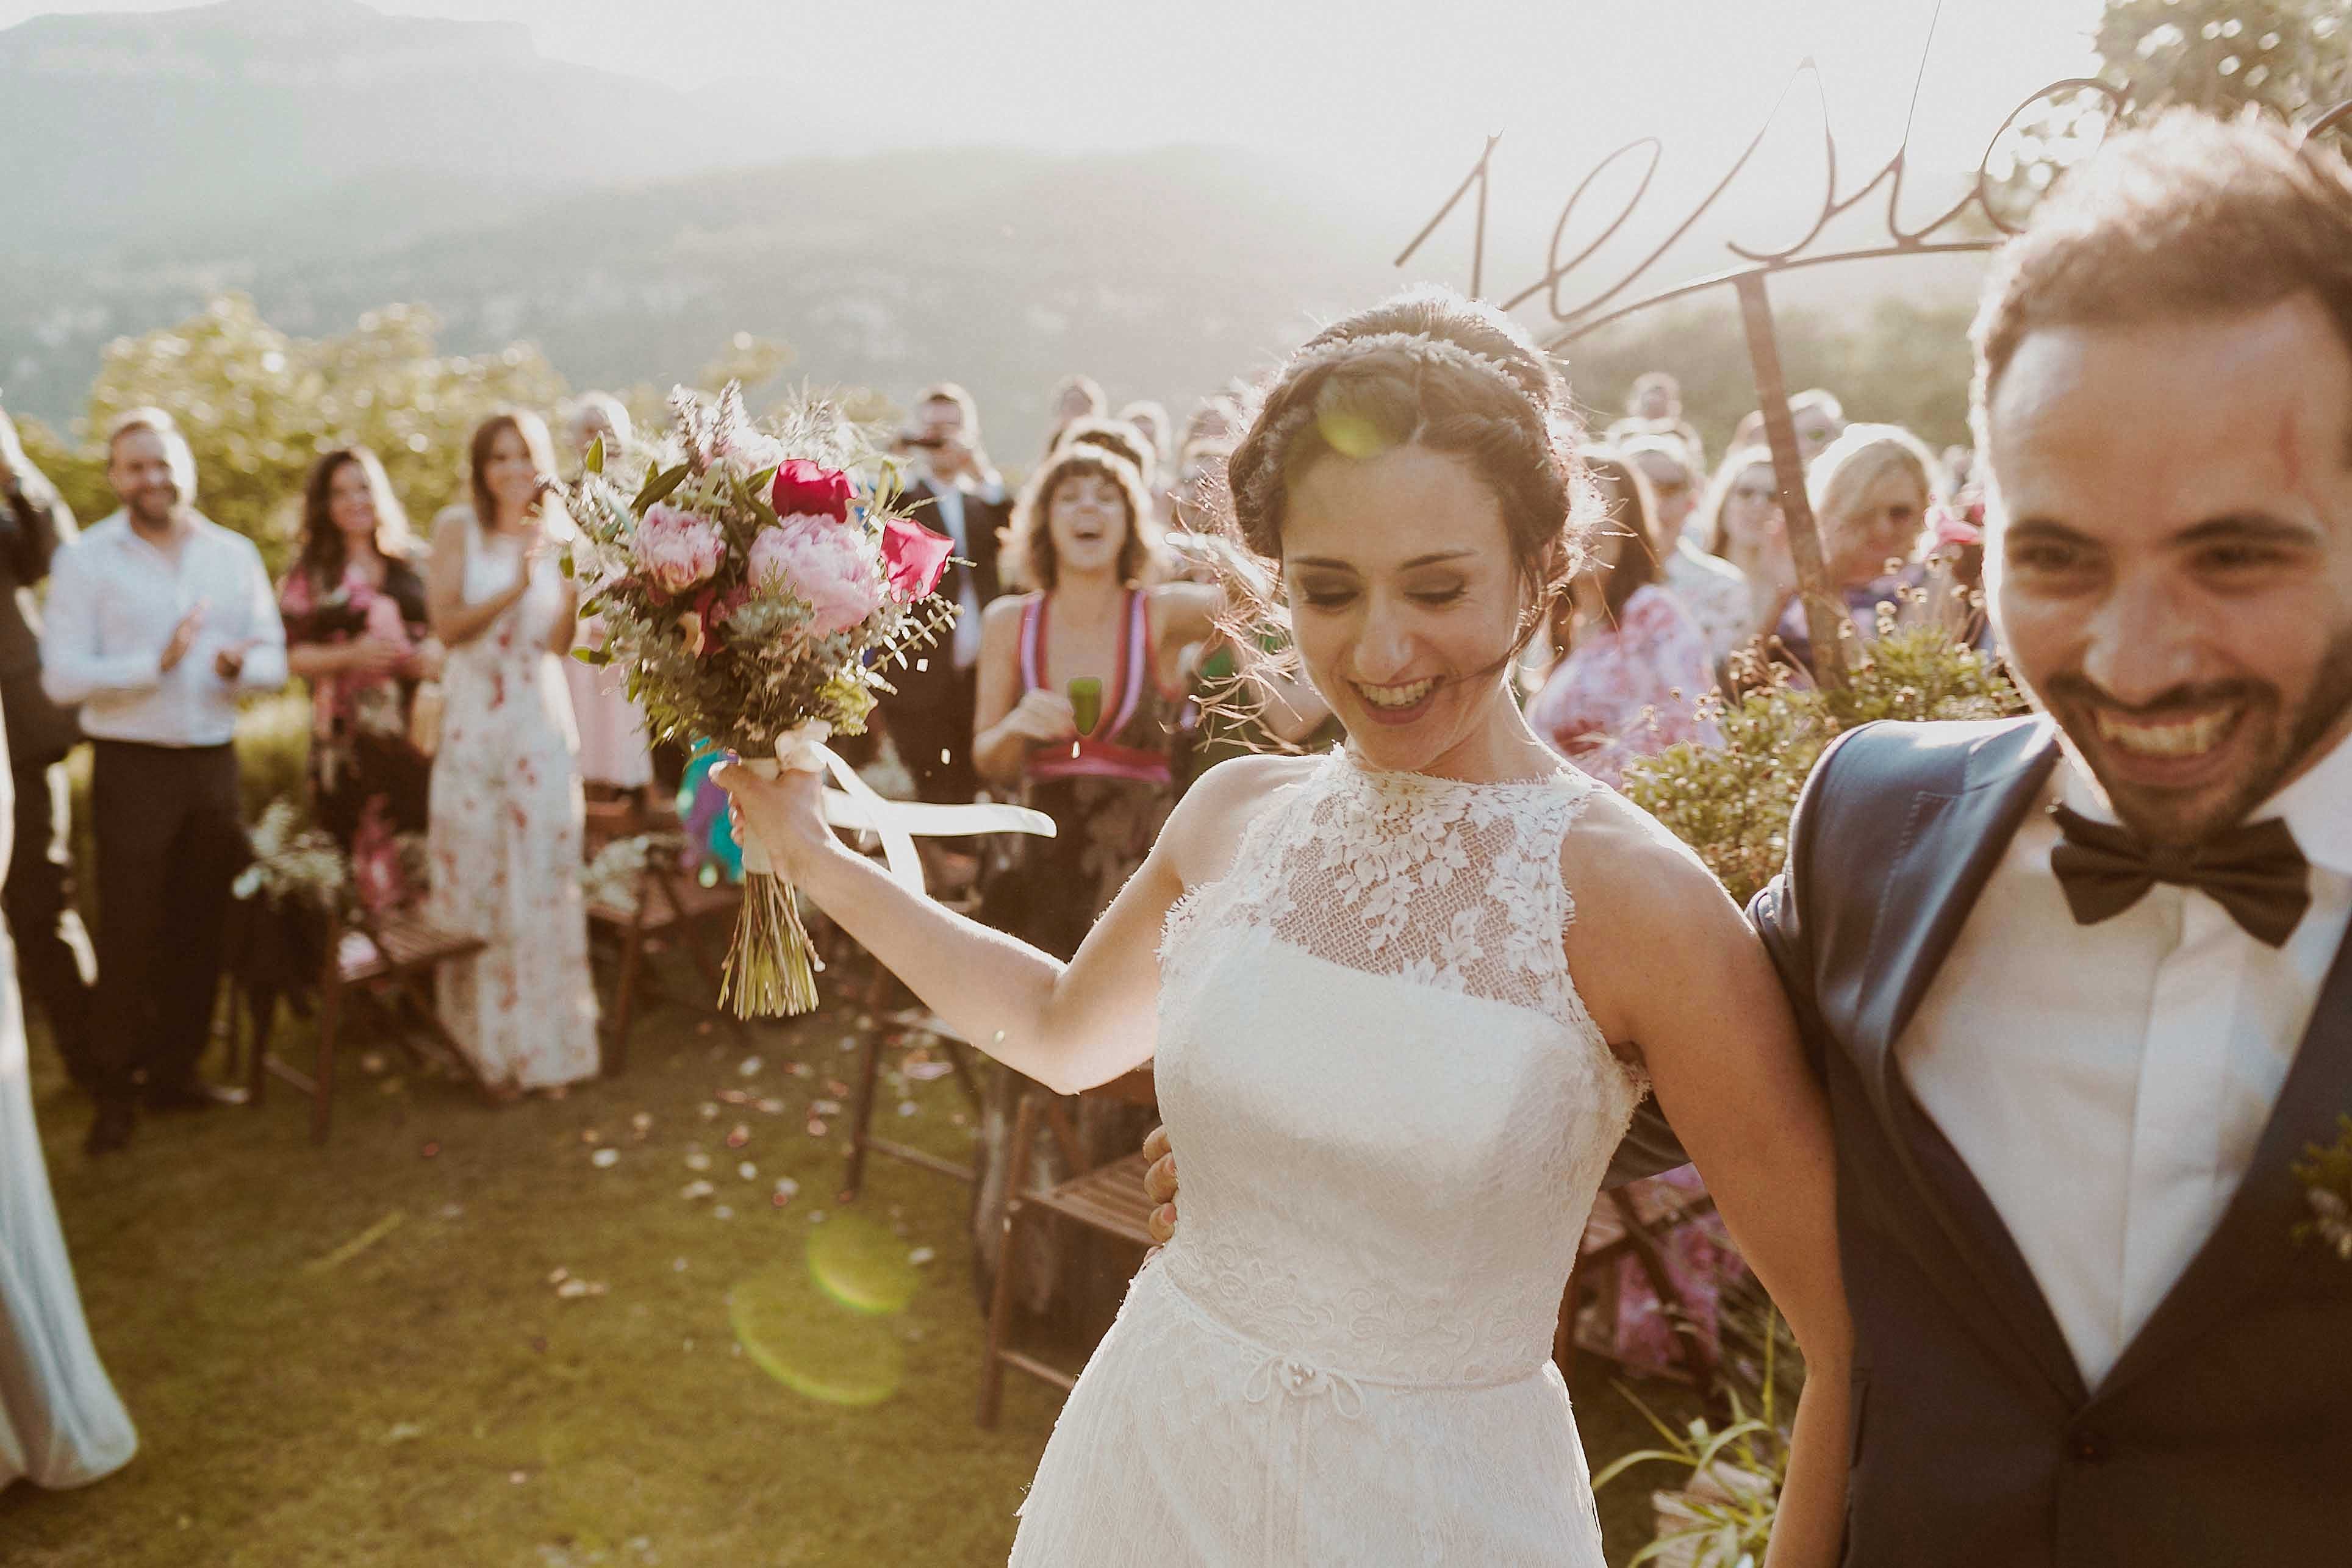 Boda rústica en la montaña. fotgrafo de bodas barcelona_067